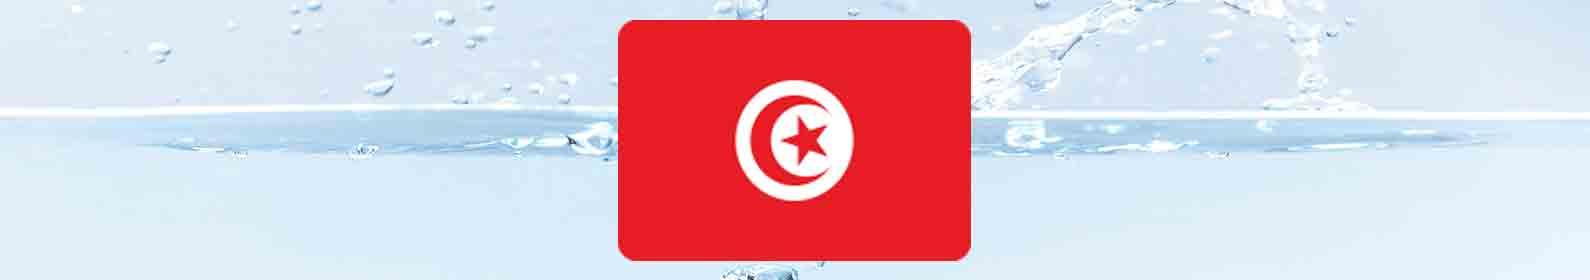 tratamento-de-agua-tunisia.jpg